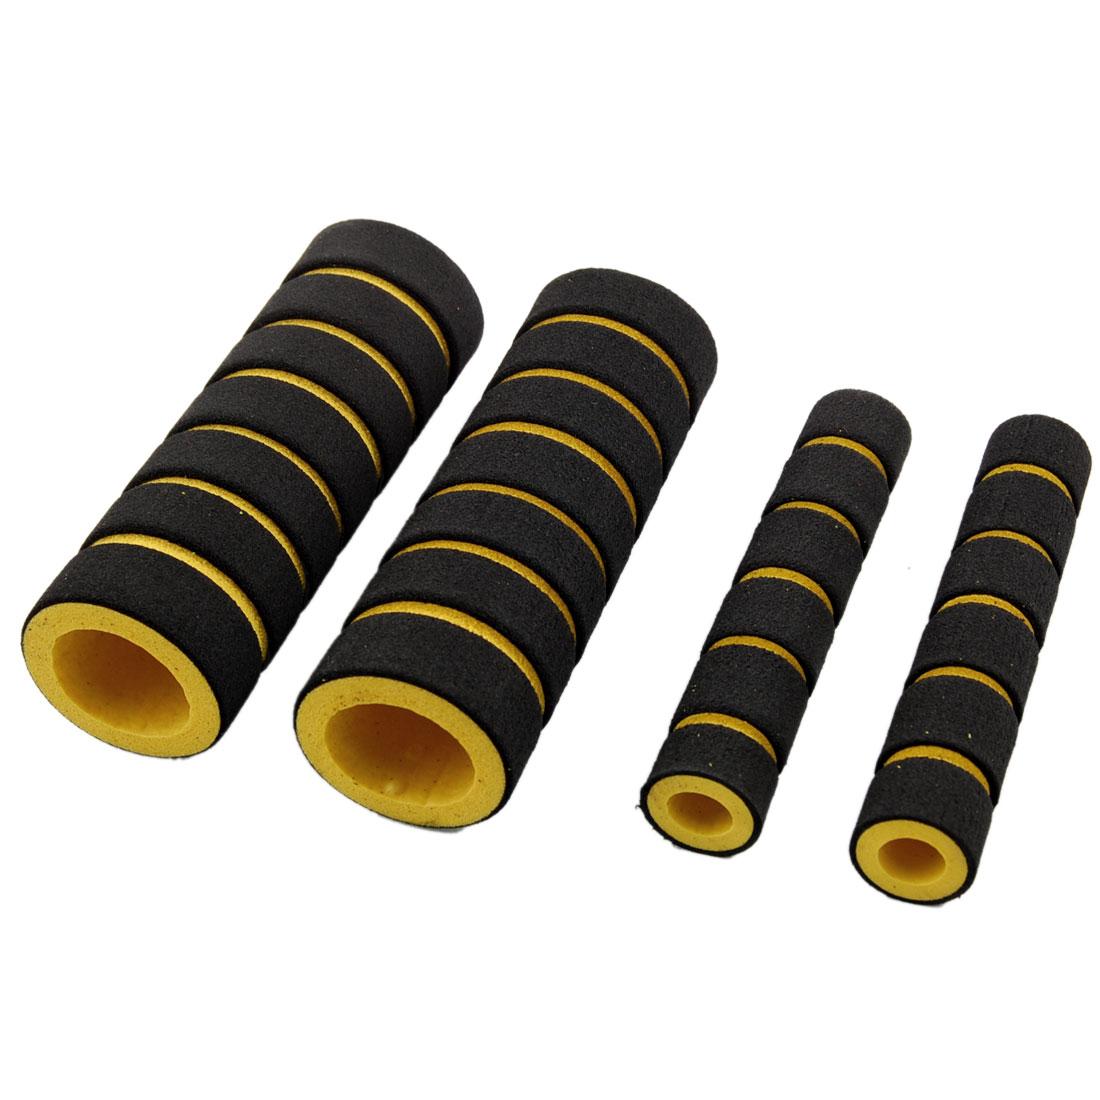 4 Pcs Replacement Nonslip Safe Bike Handle Bar Grips Black Yellow